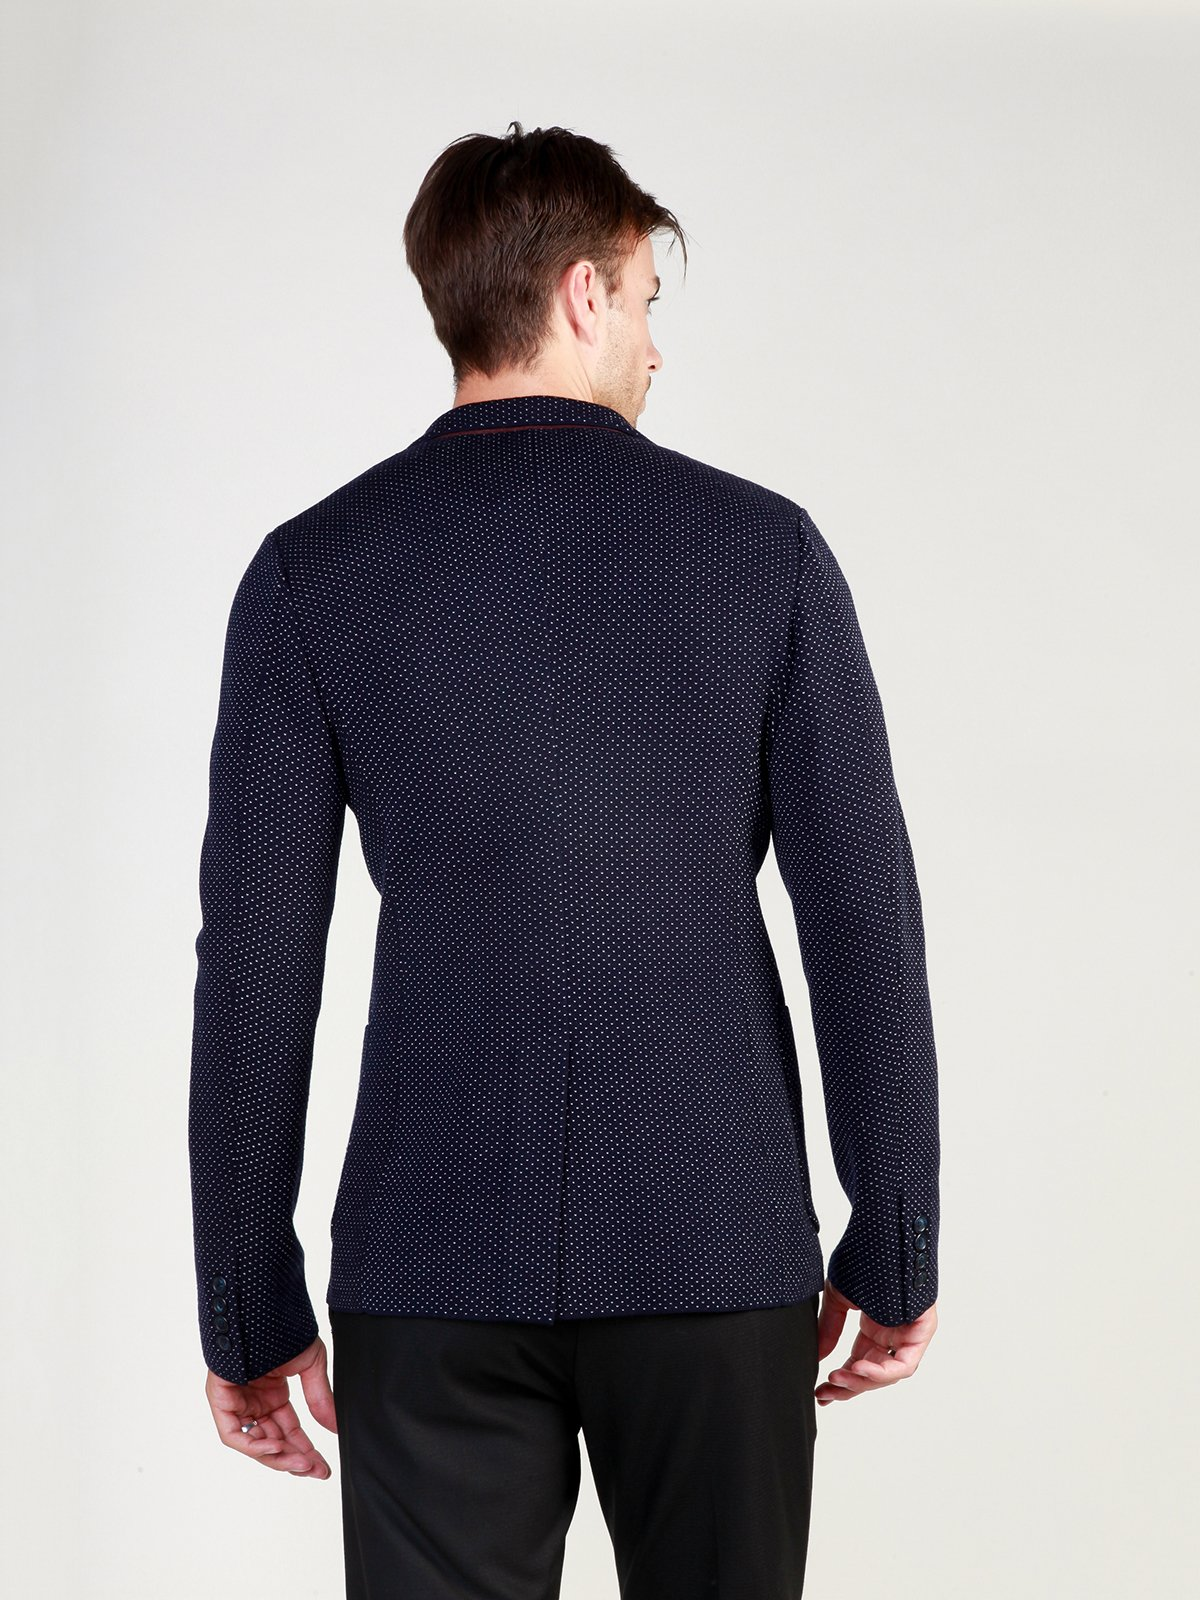 Пиджак темно-синий в рисунок | 3748934 | фото 2